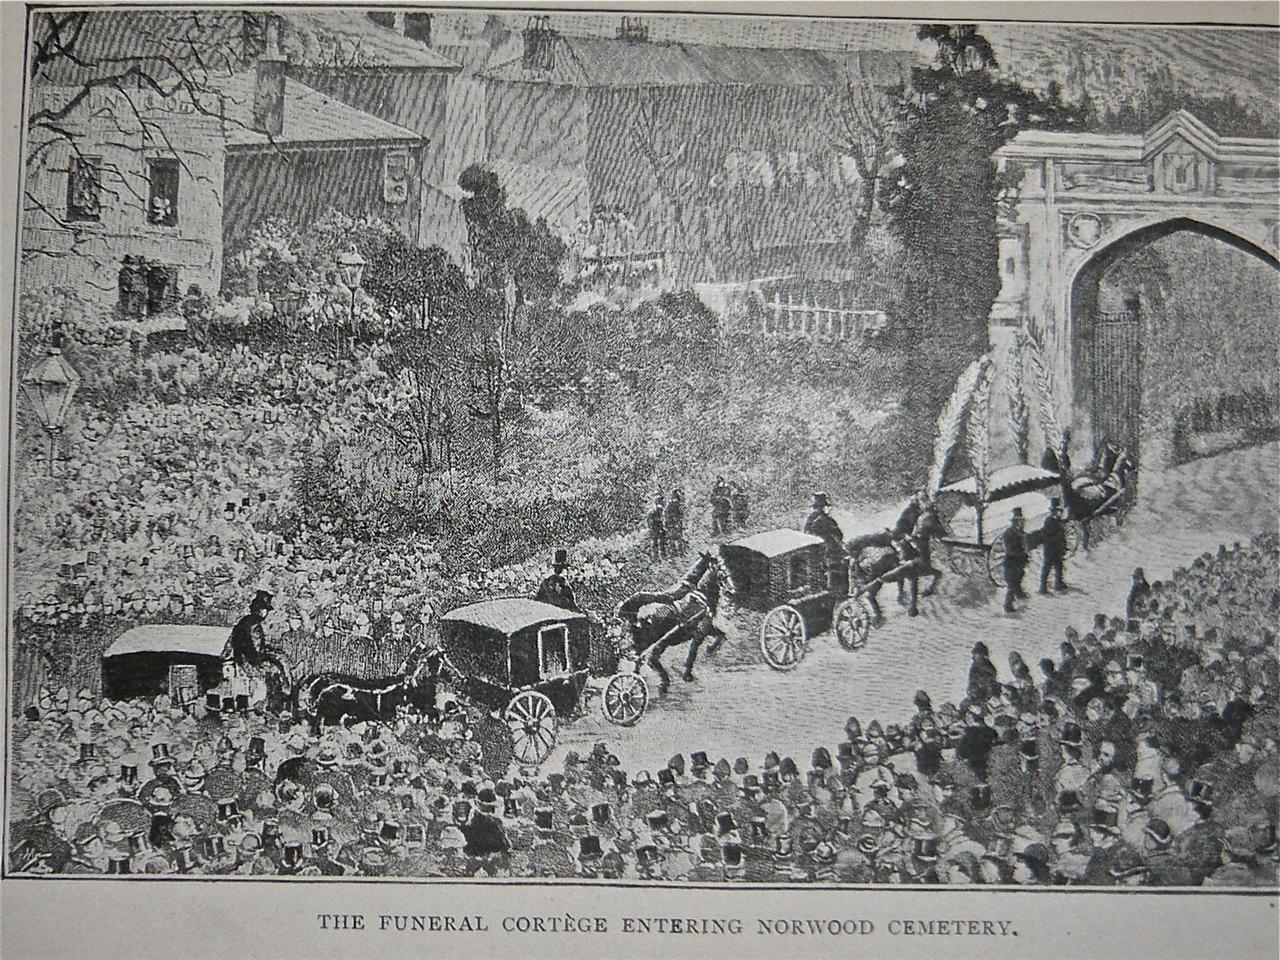 spurgeon_s_funeral_procession.jpg